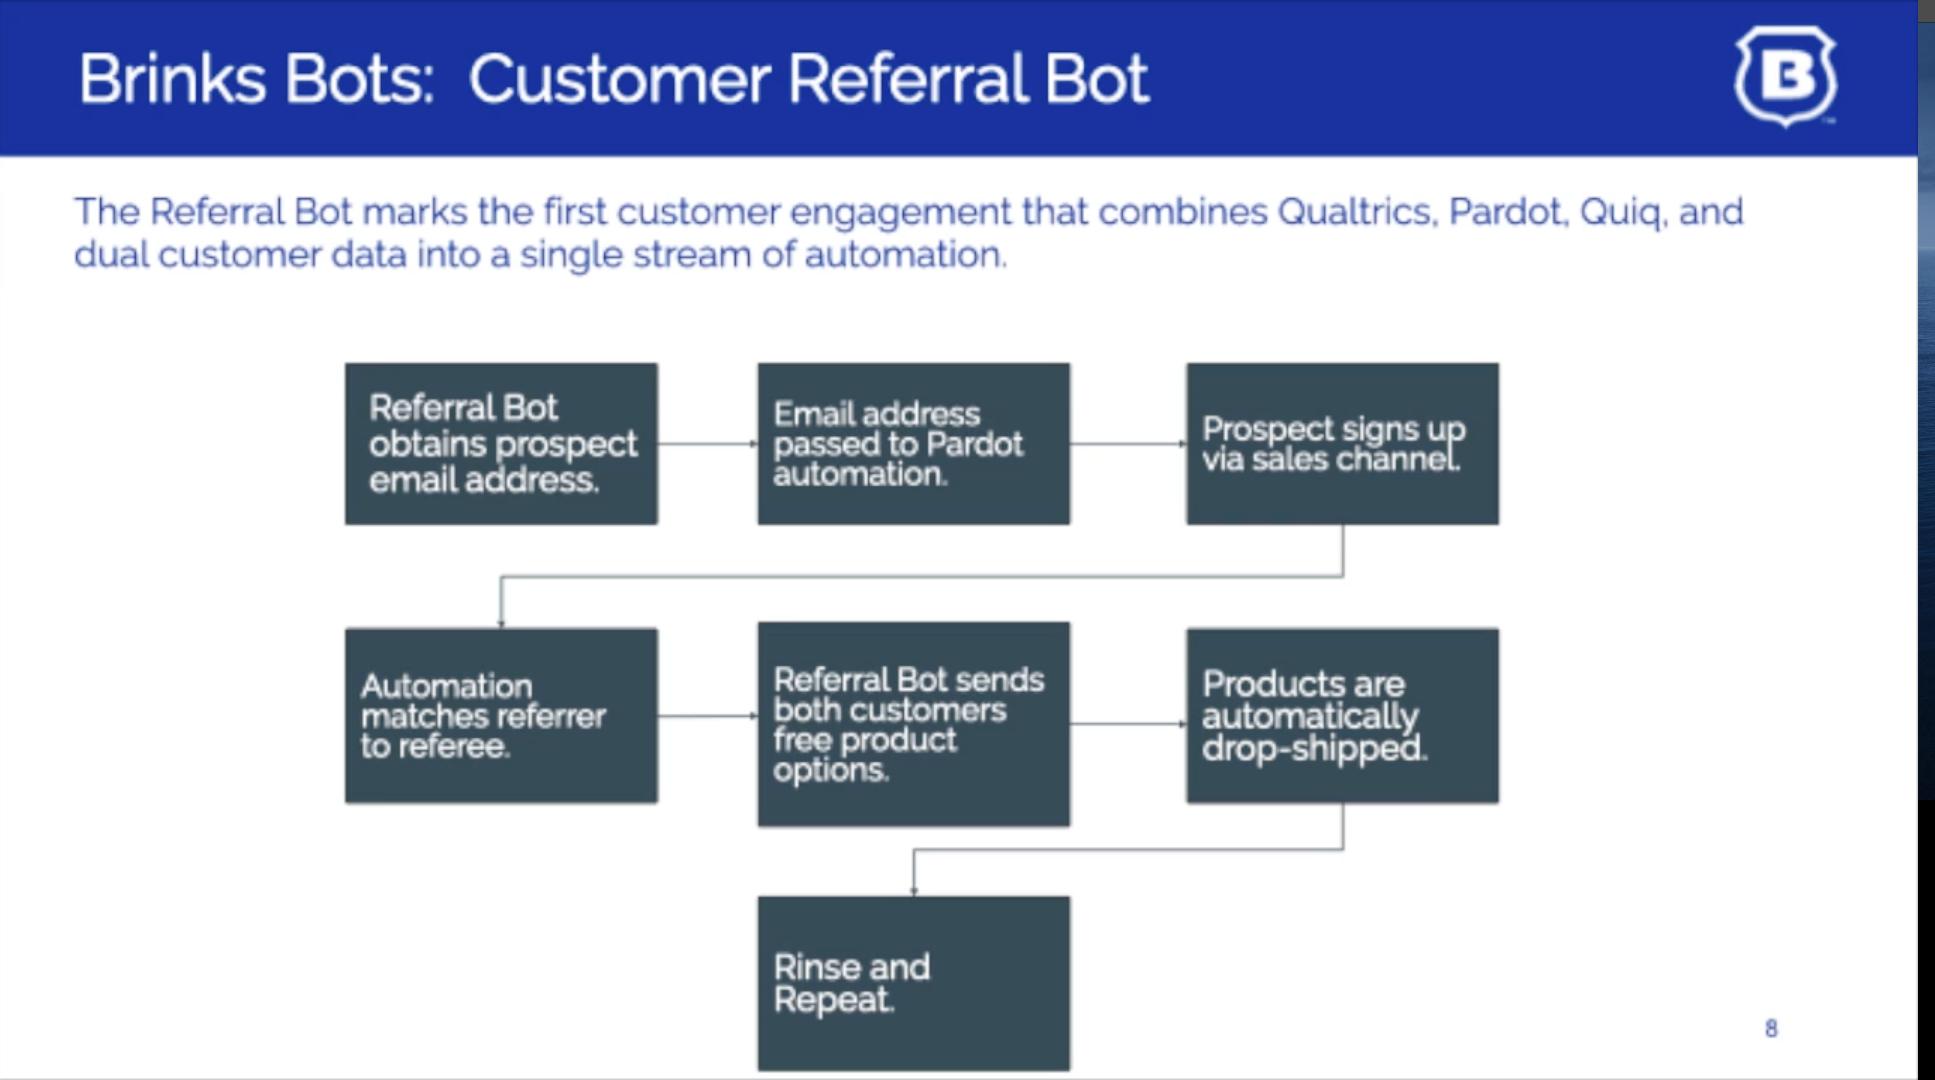 Brink Bots customer referral bot for customer engagement